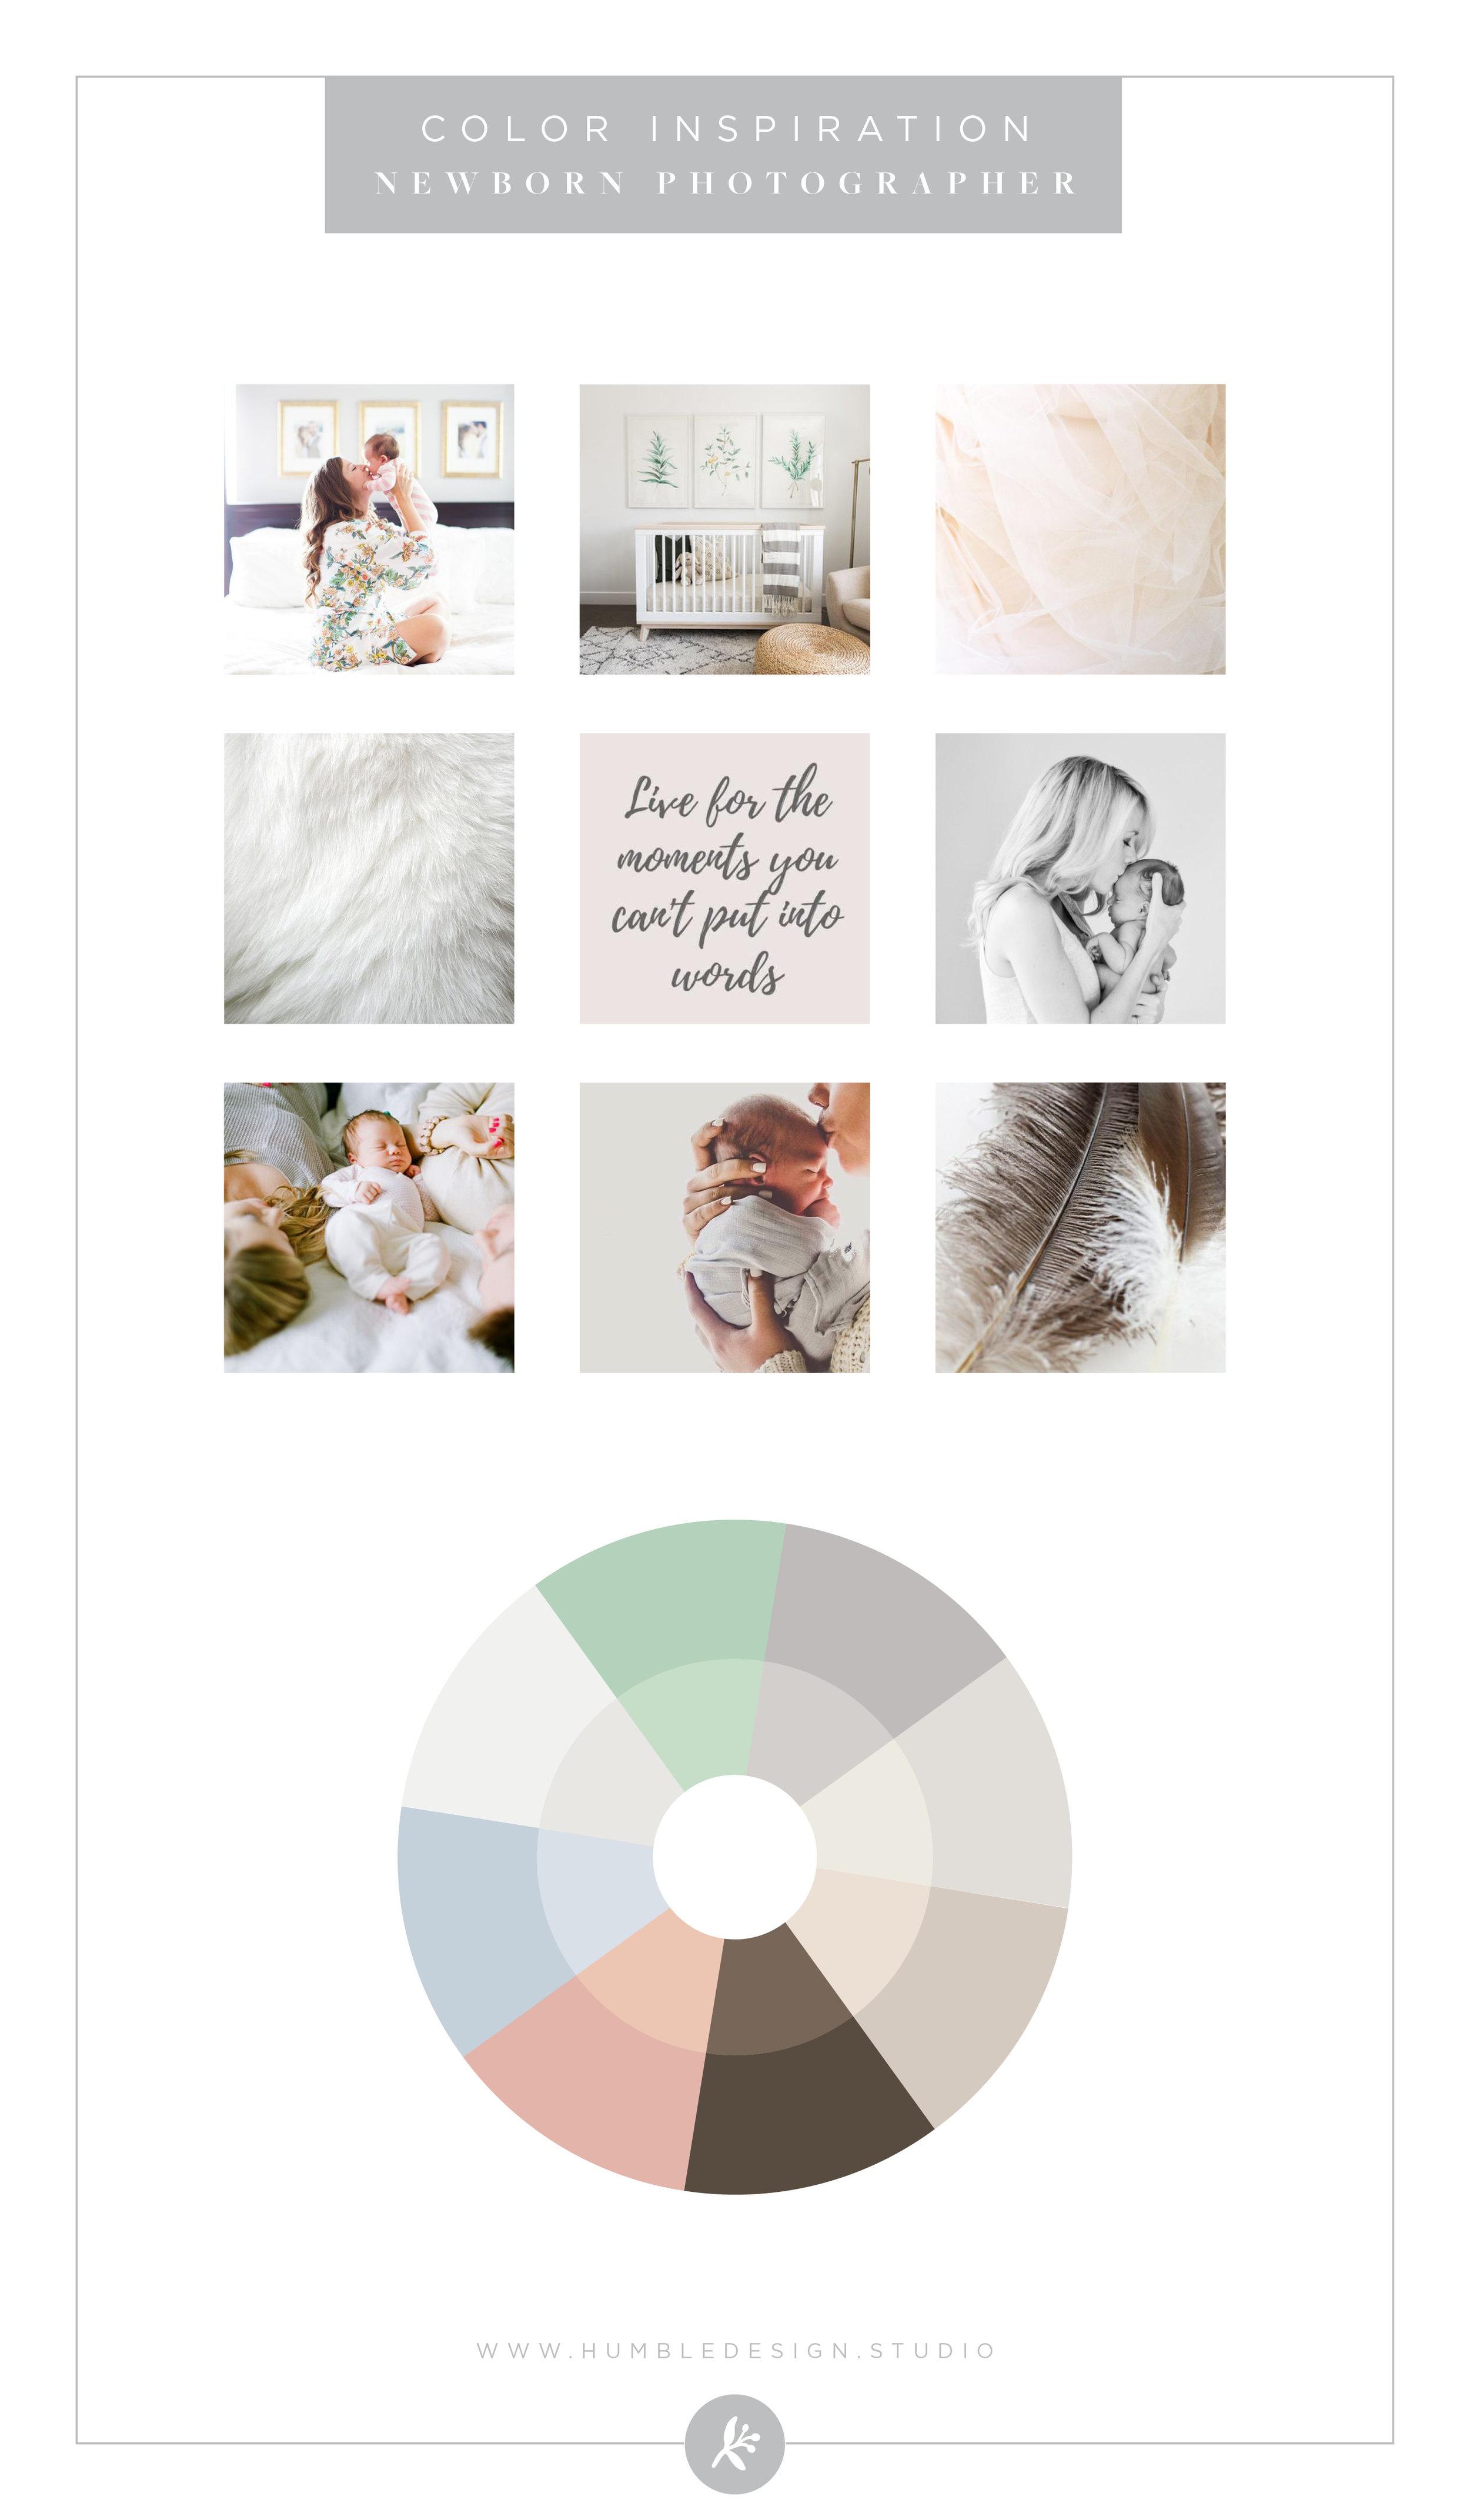 Newborn Photographer - Color Palette Inspiration